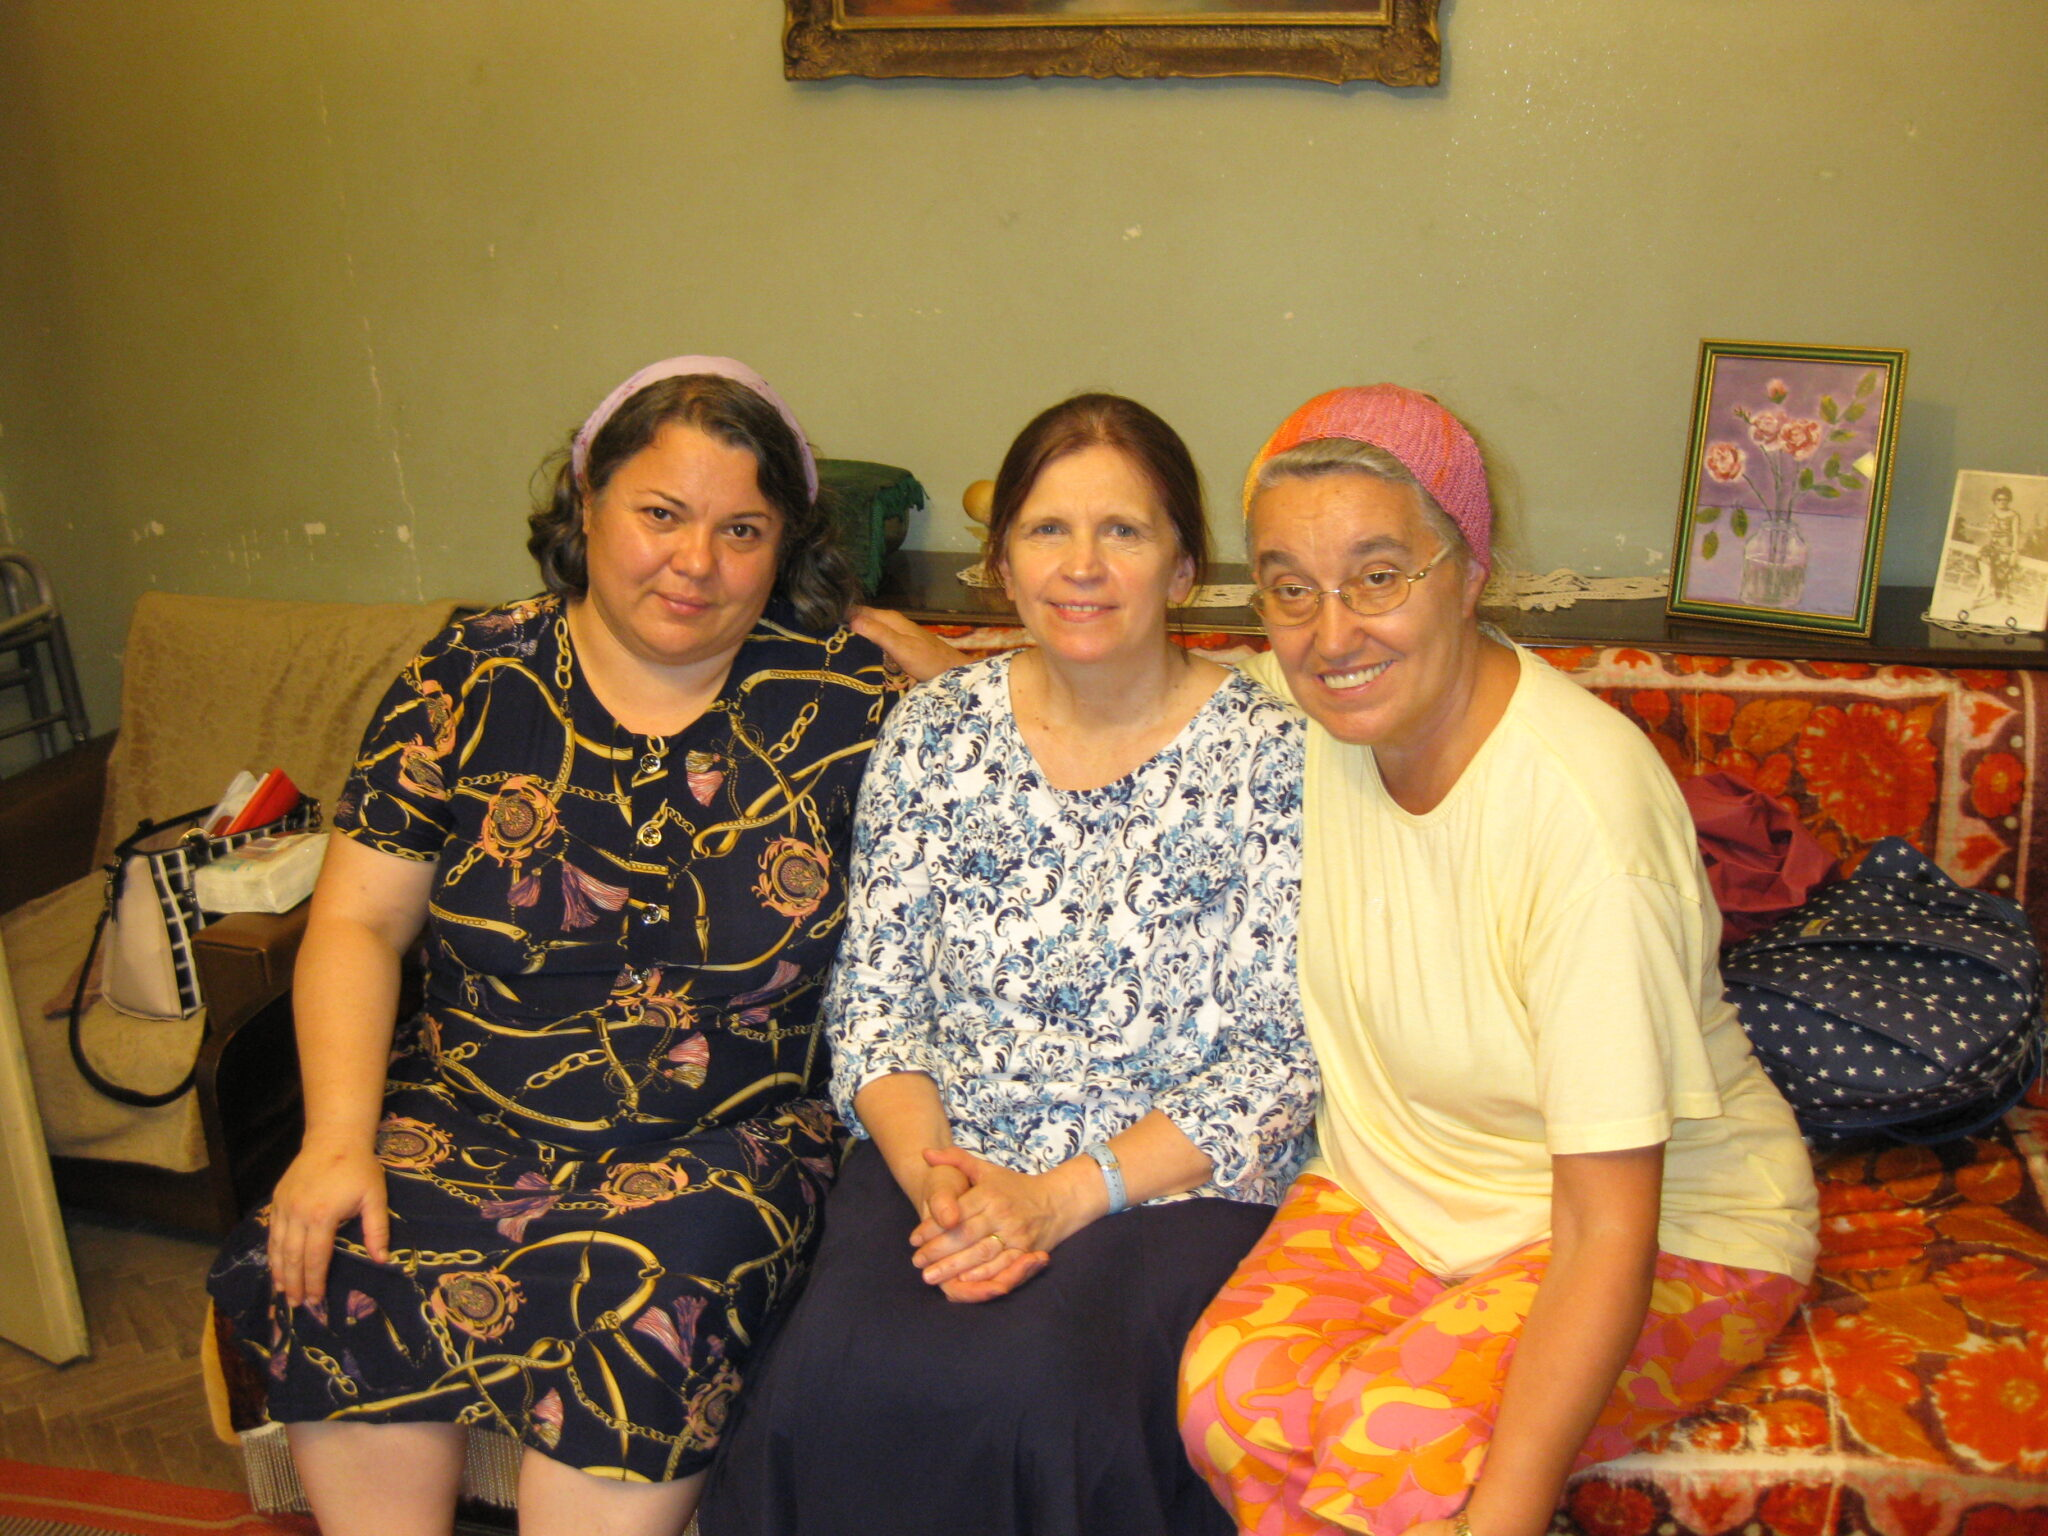 SURORILE ADINA, MARIANA SI LIDIA IN VIZITA LA TANTI DORICA SAULEA CARE A IMPLINIT 90 DE ANI